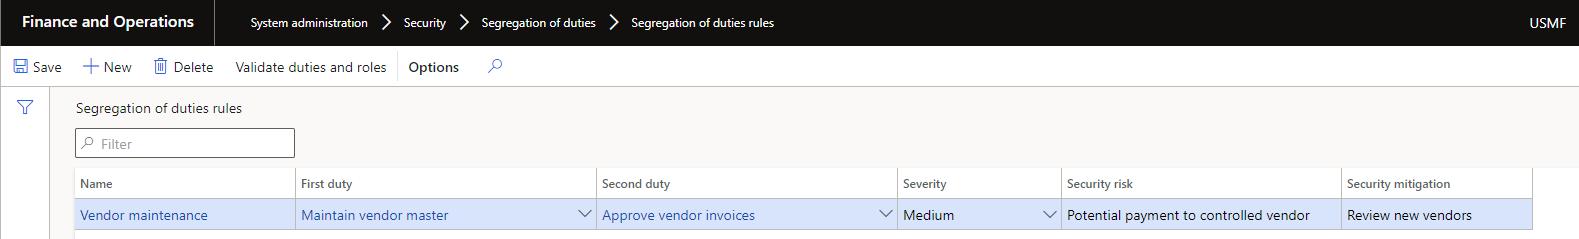 dynamics 365 segregation of duties